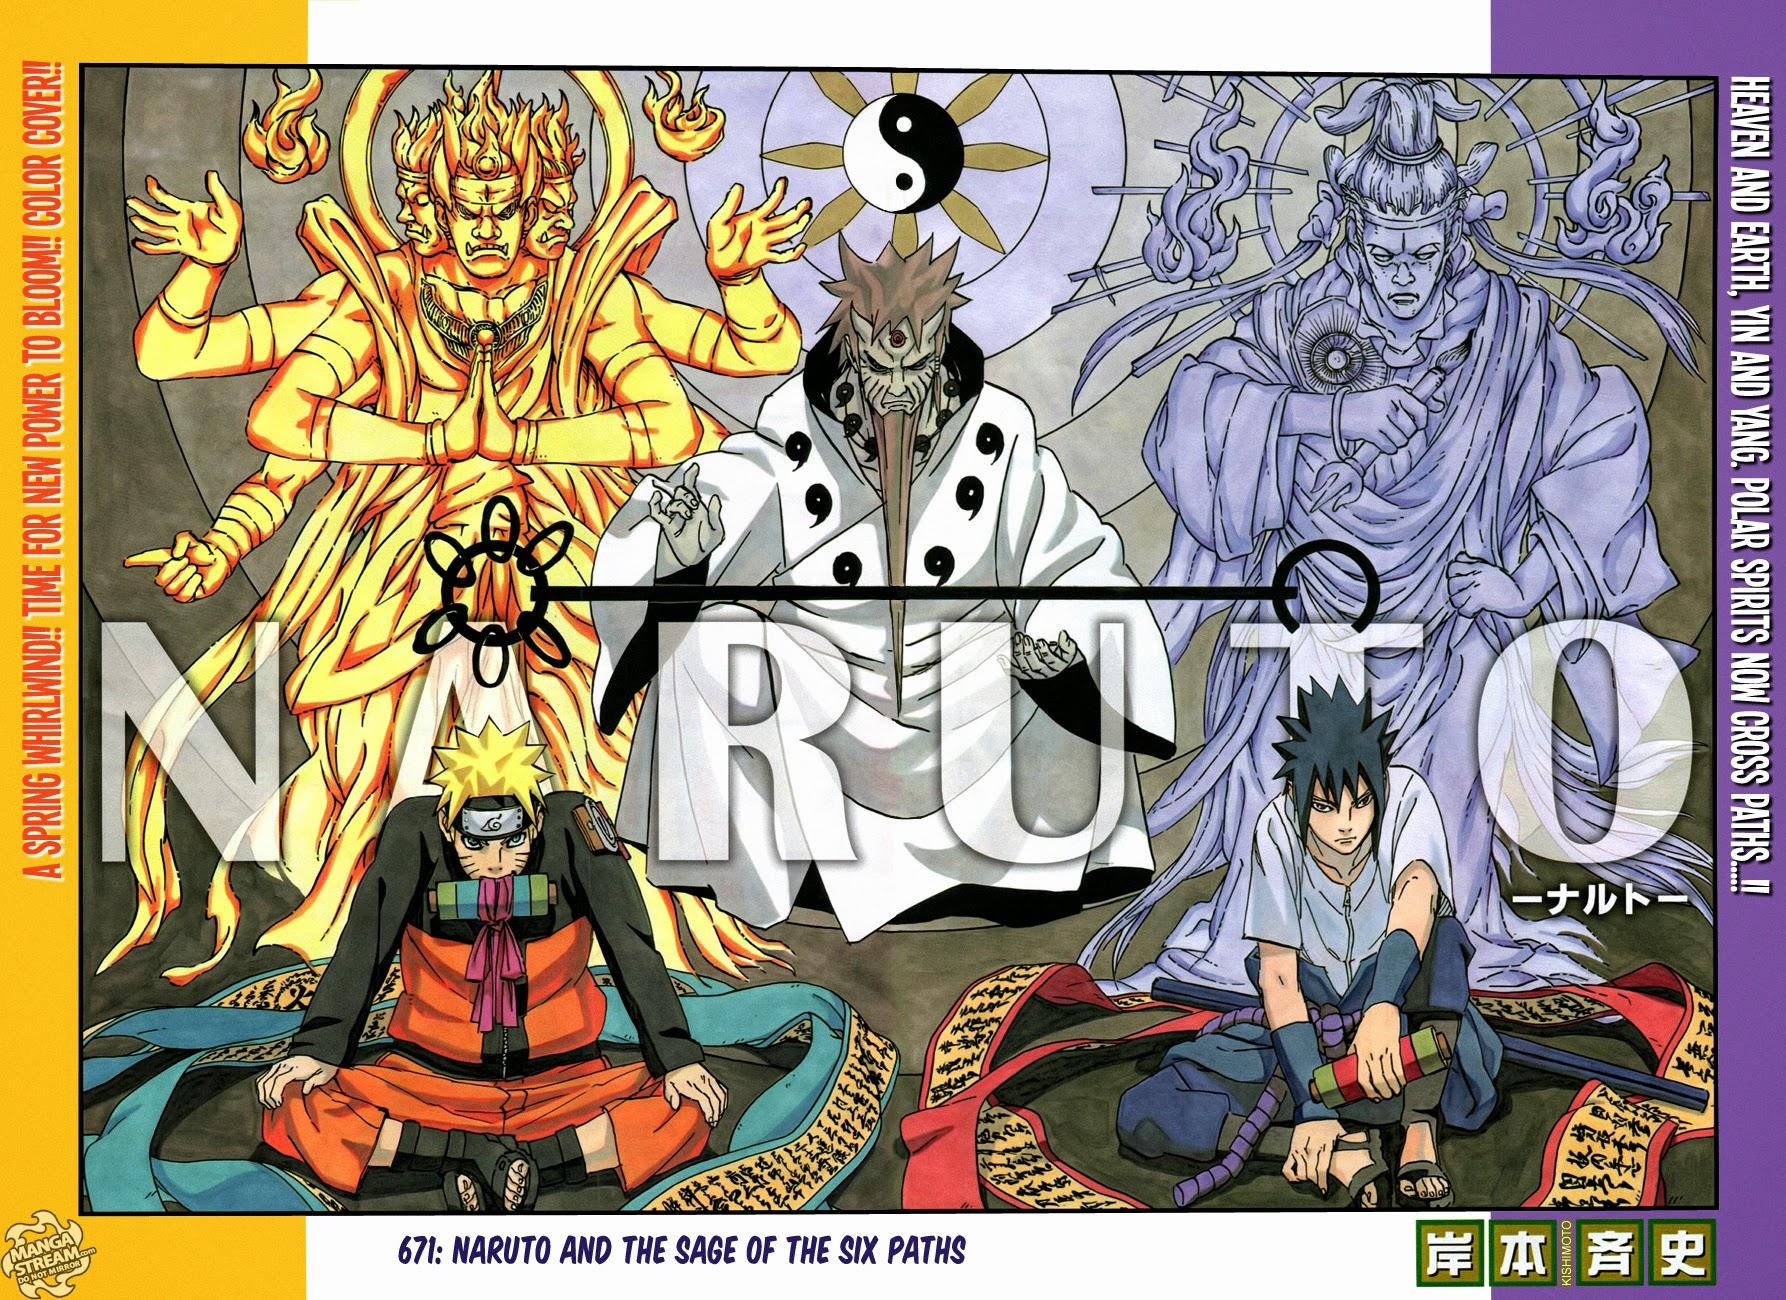 Naruto671 CartoonClub TH 004 Naruto Ch.671 นารูโตะกับเซียนหกวิถี...!!